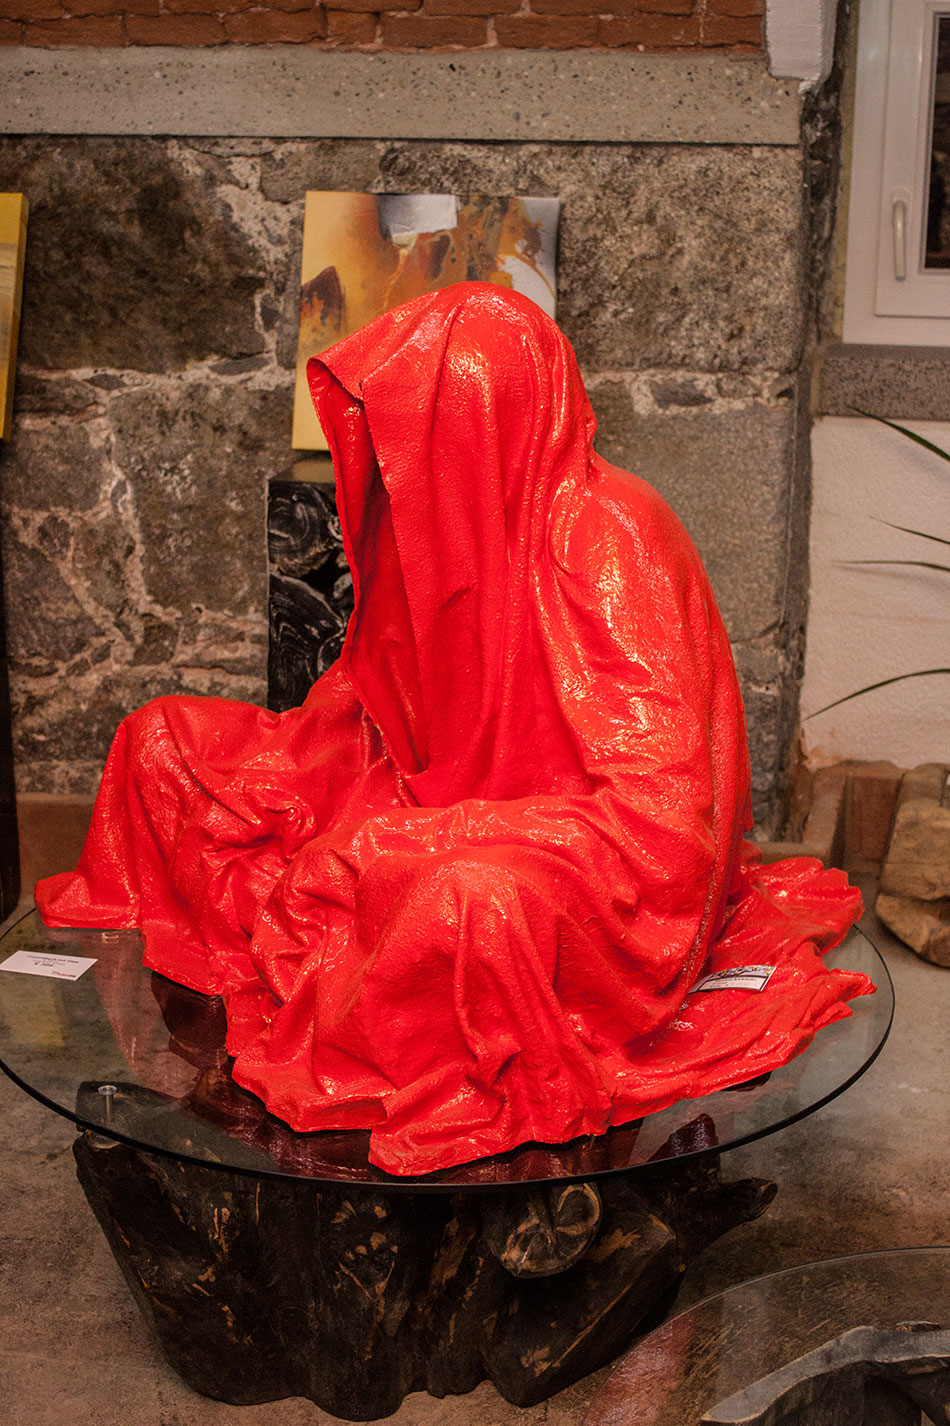 mobile-galerie-gall-toko06-linz-25er-turm-guardians-of-time-manfred-kielnhofer-contemporary-fine-art-design-sculpture-2653